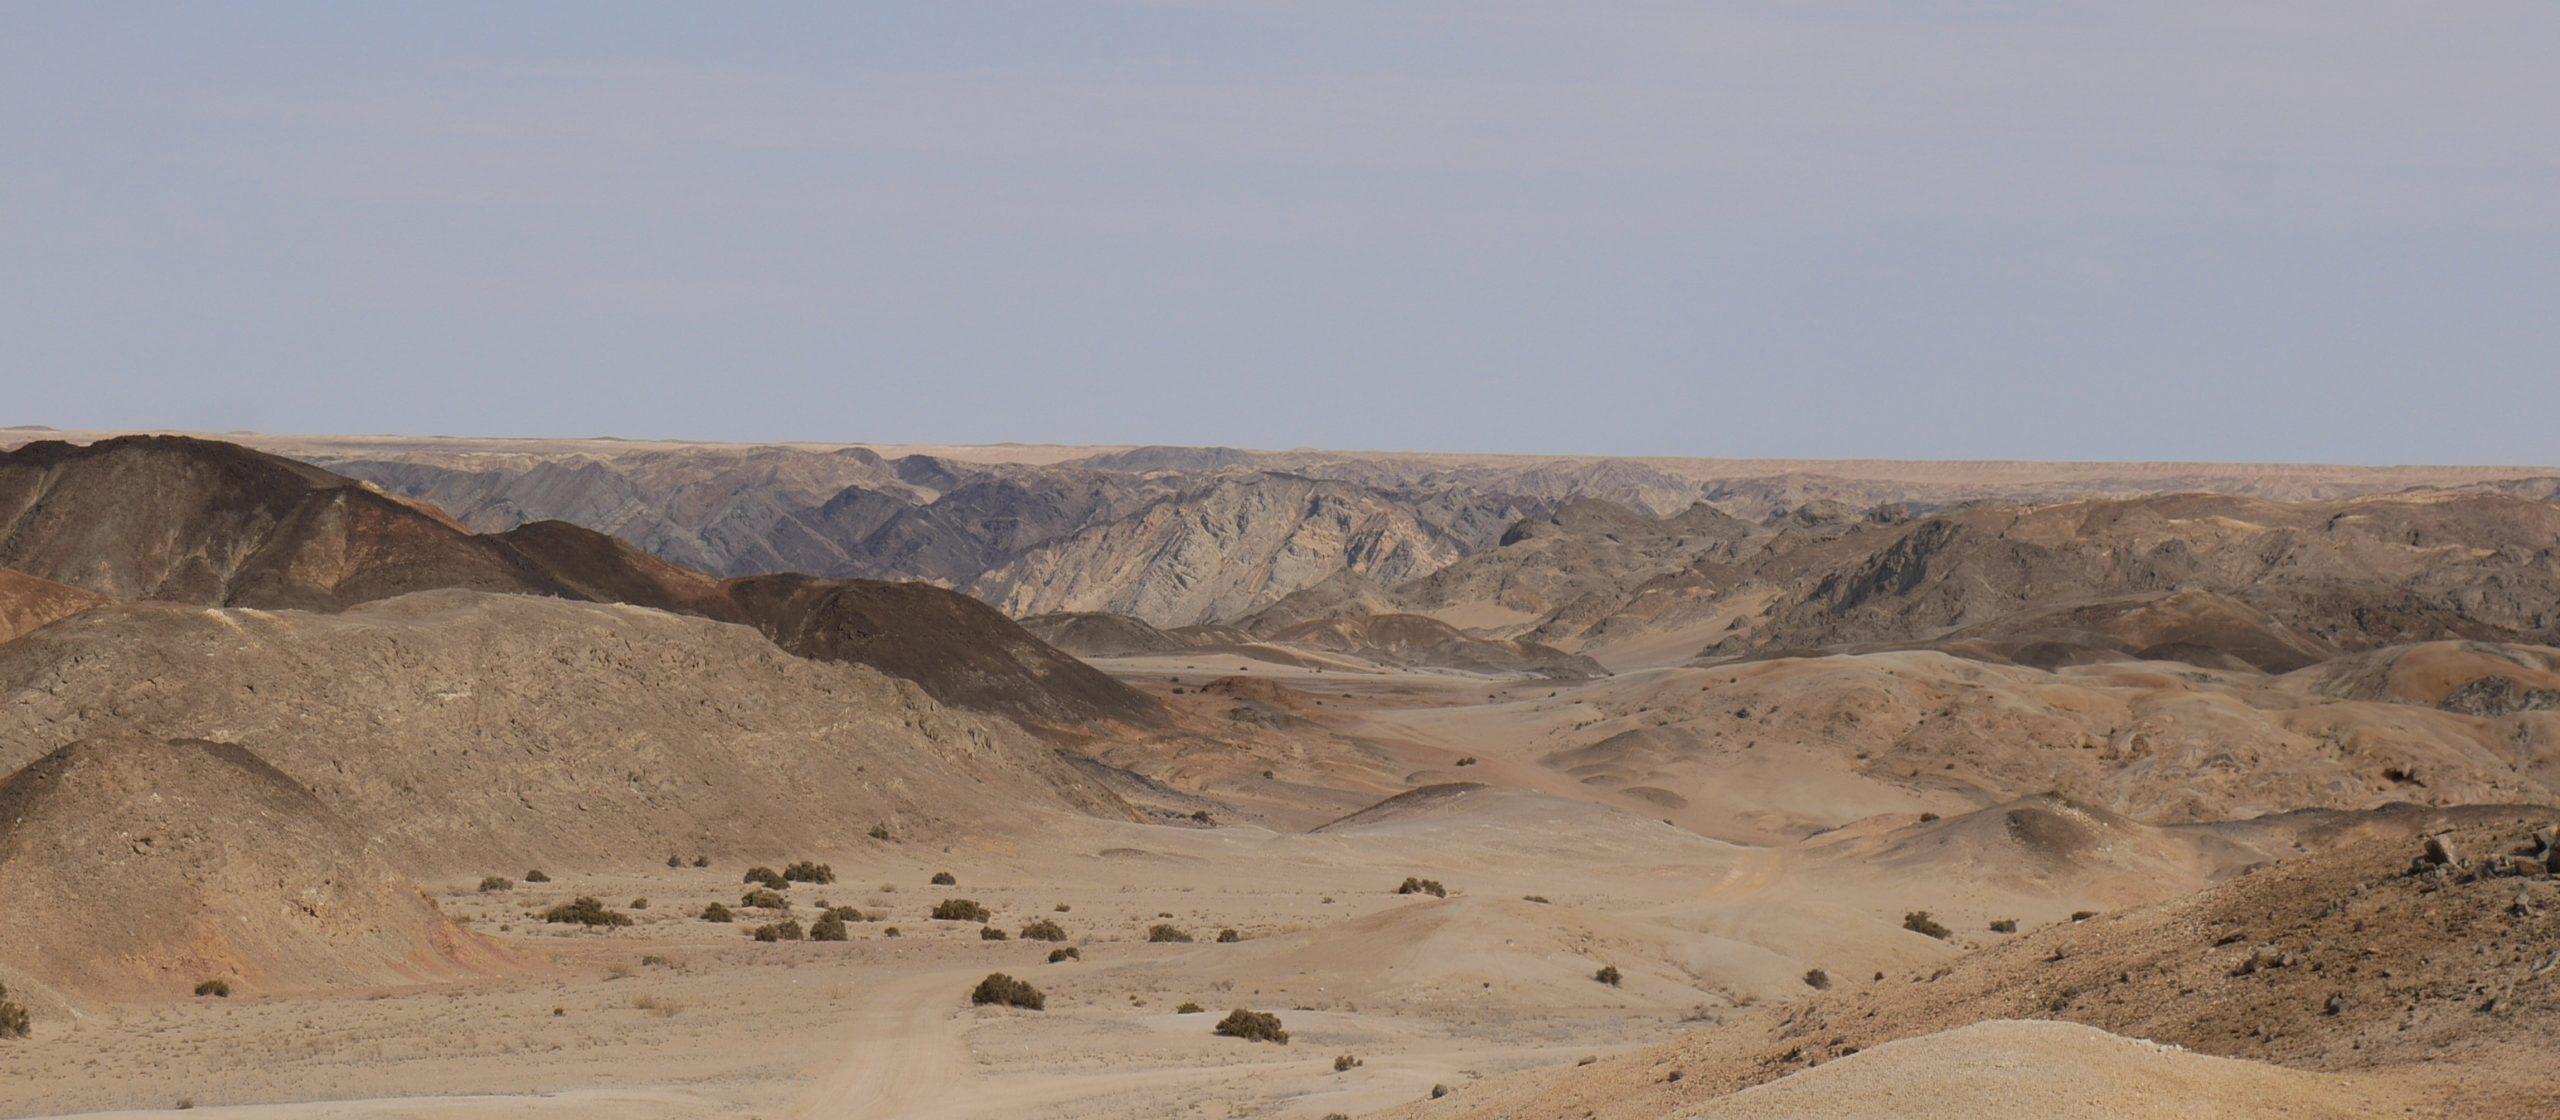 OS-Moon landscape